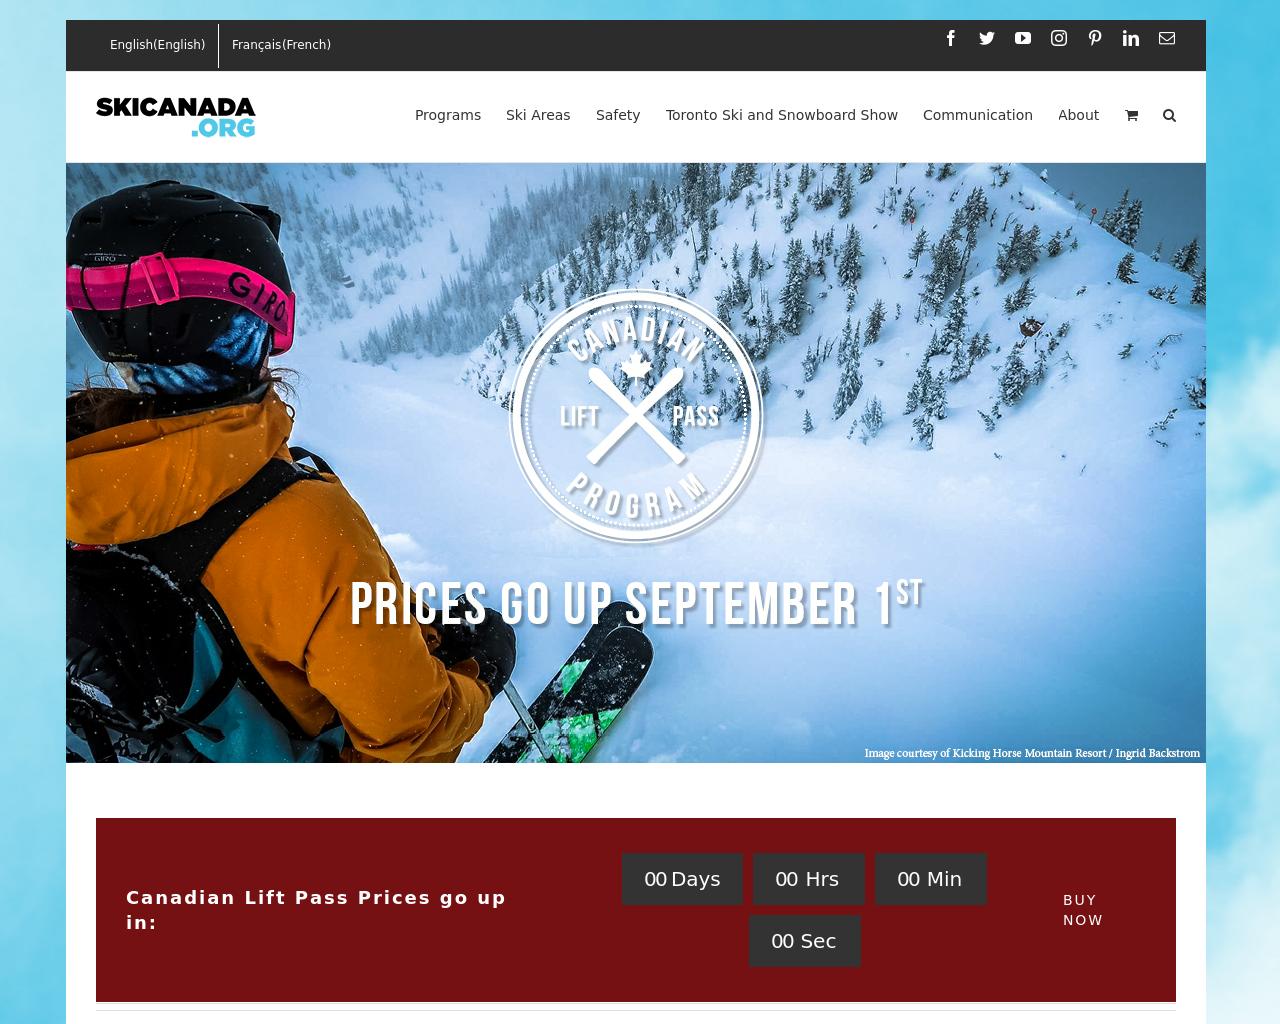 SkiCanada.org-Advertising-Reviews-Pricing